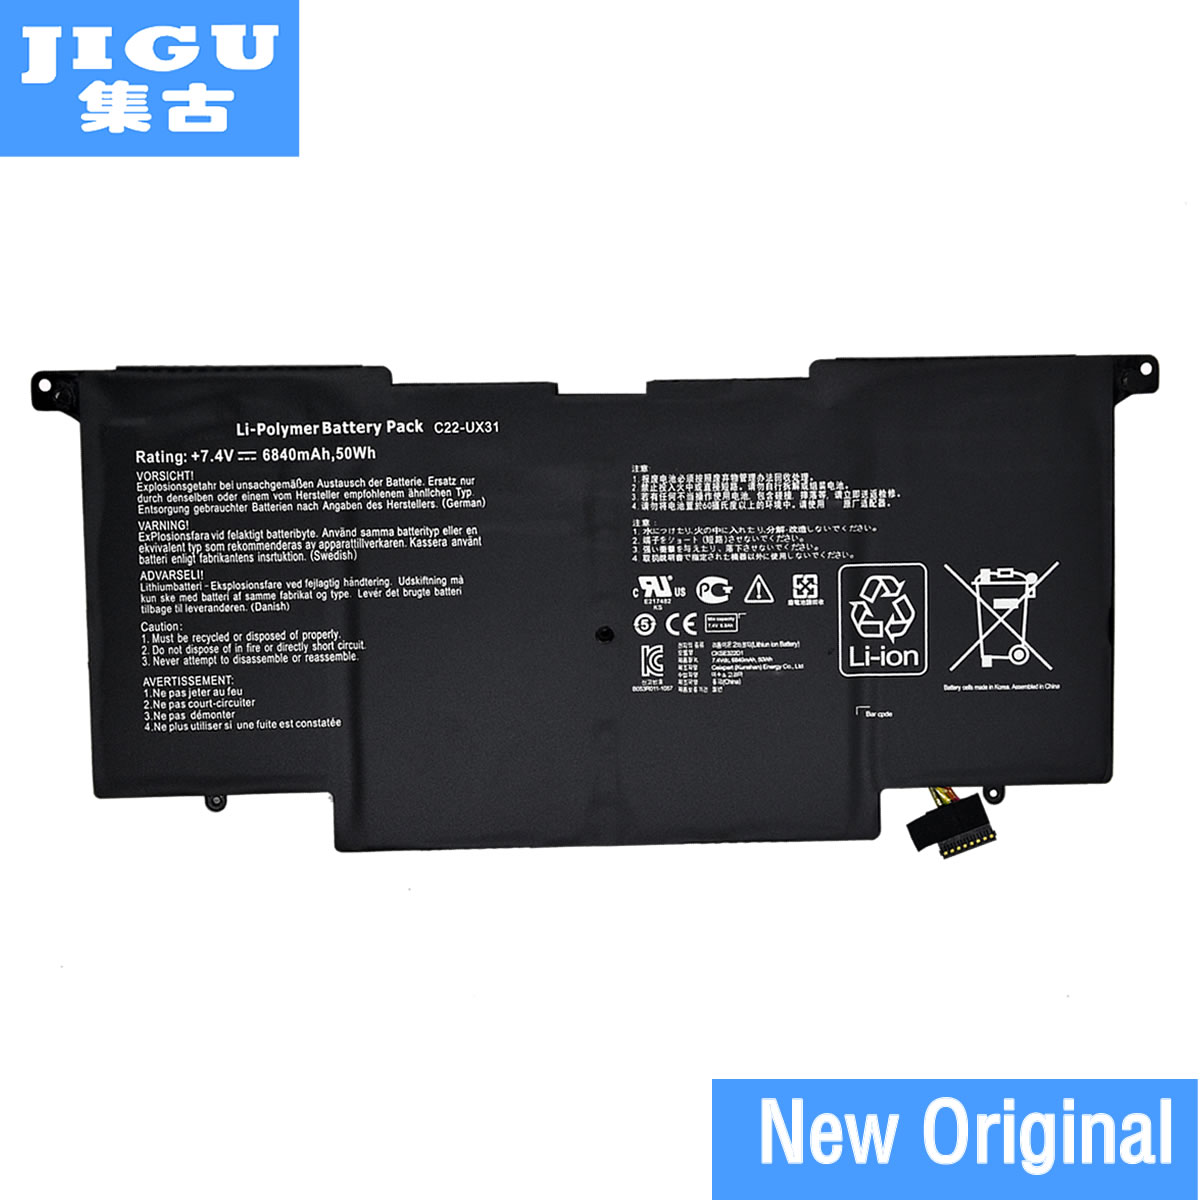 JIGU C22-UX31 C23-UX31 Original laptop Battery For Asus Ultrabook ZENBOOK UX31 UX31A UX31E 7.4V 6840MAH 50WH цена 2017